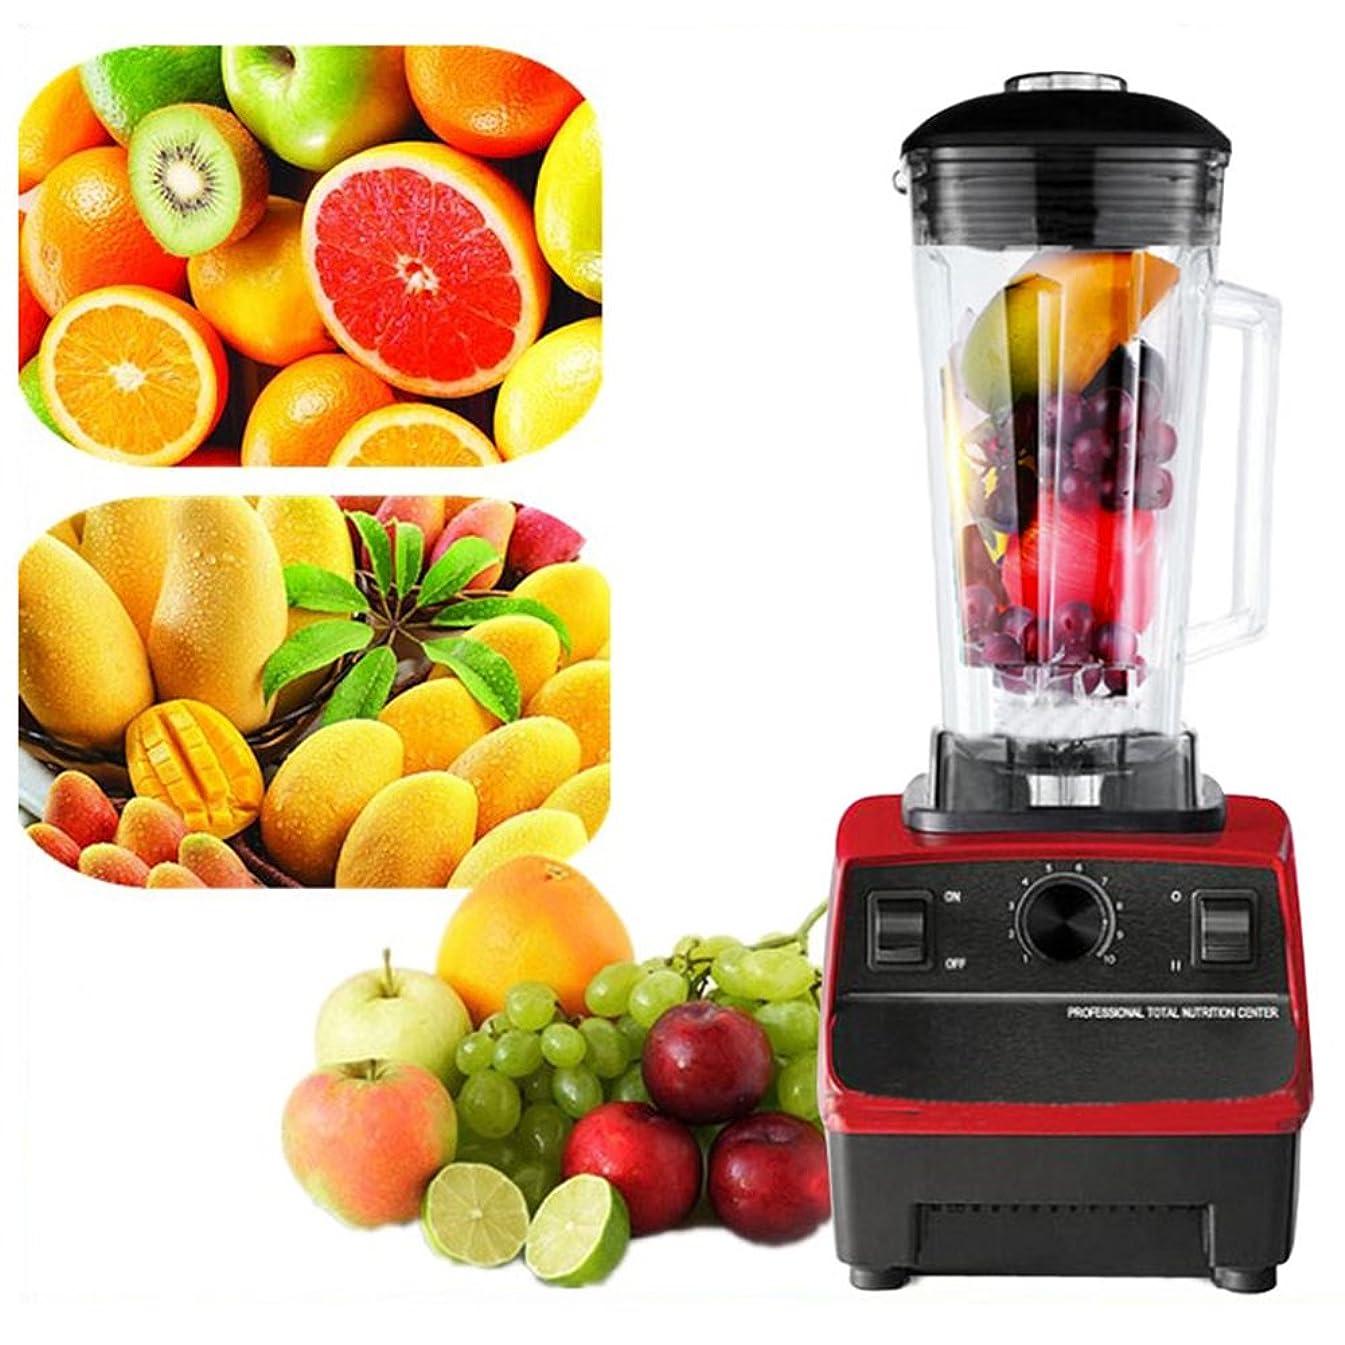 Binglinghua 2L 2200W Heavy Duty Commercial Grade Blender Mixer Juicer Fruit Blender